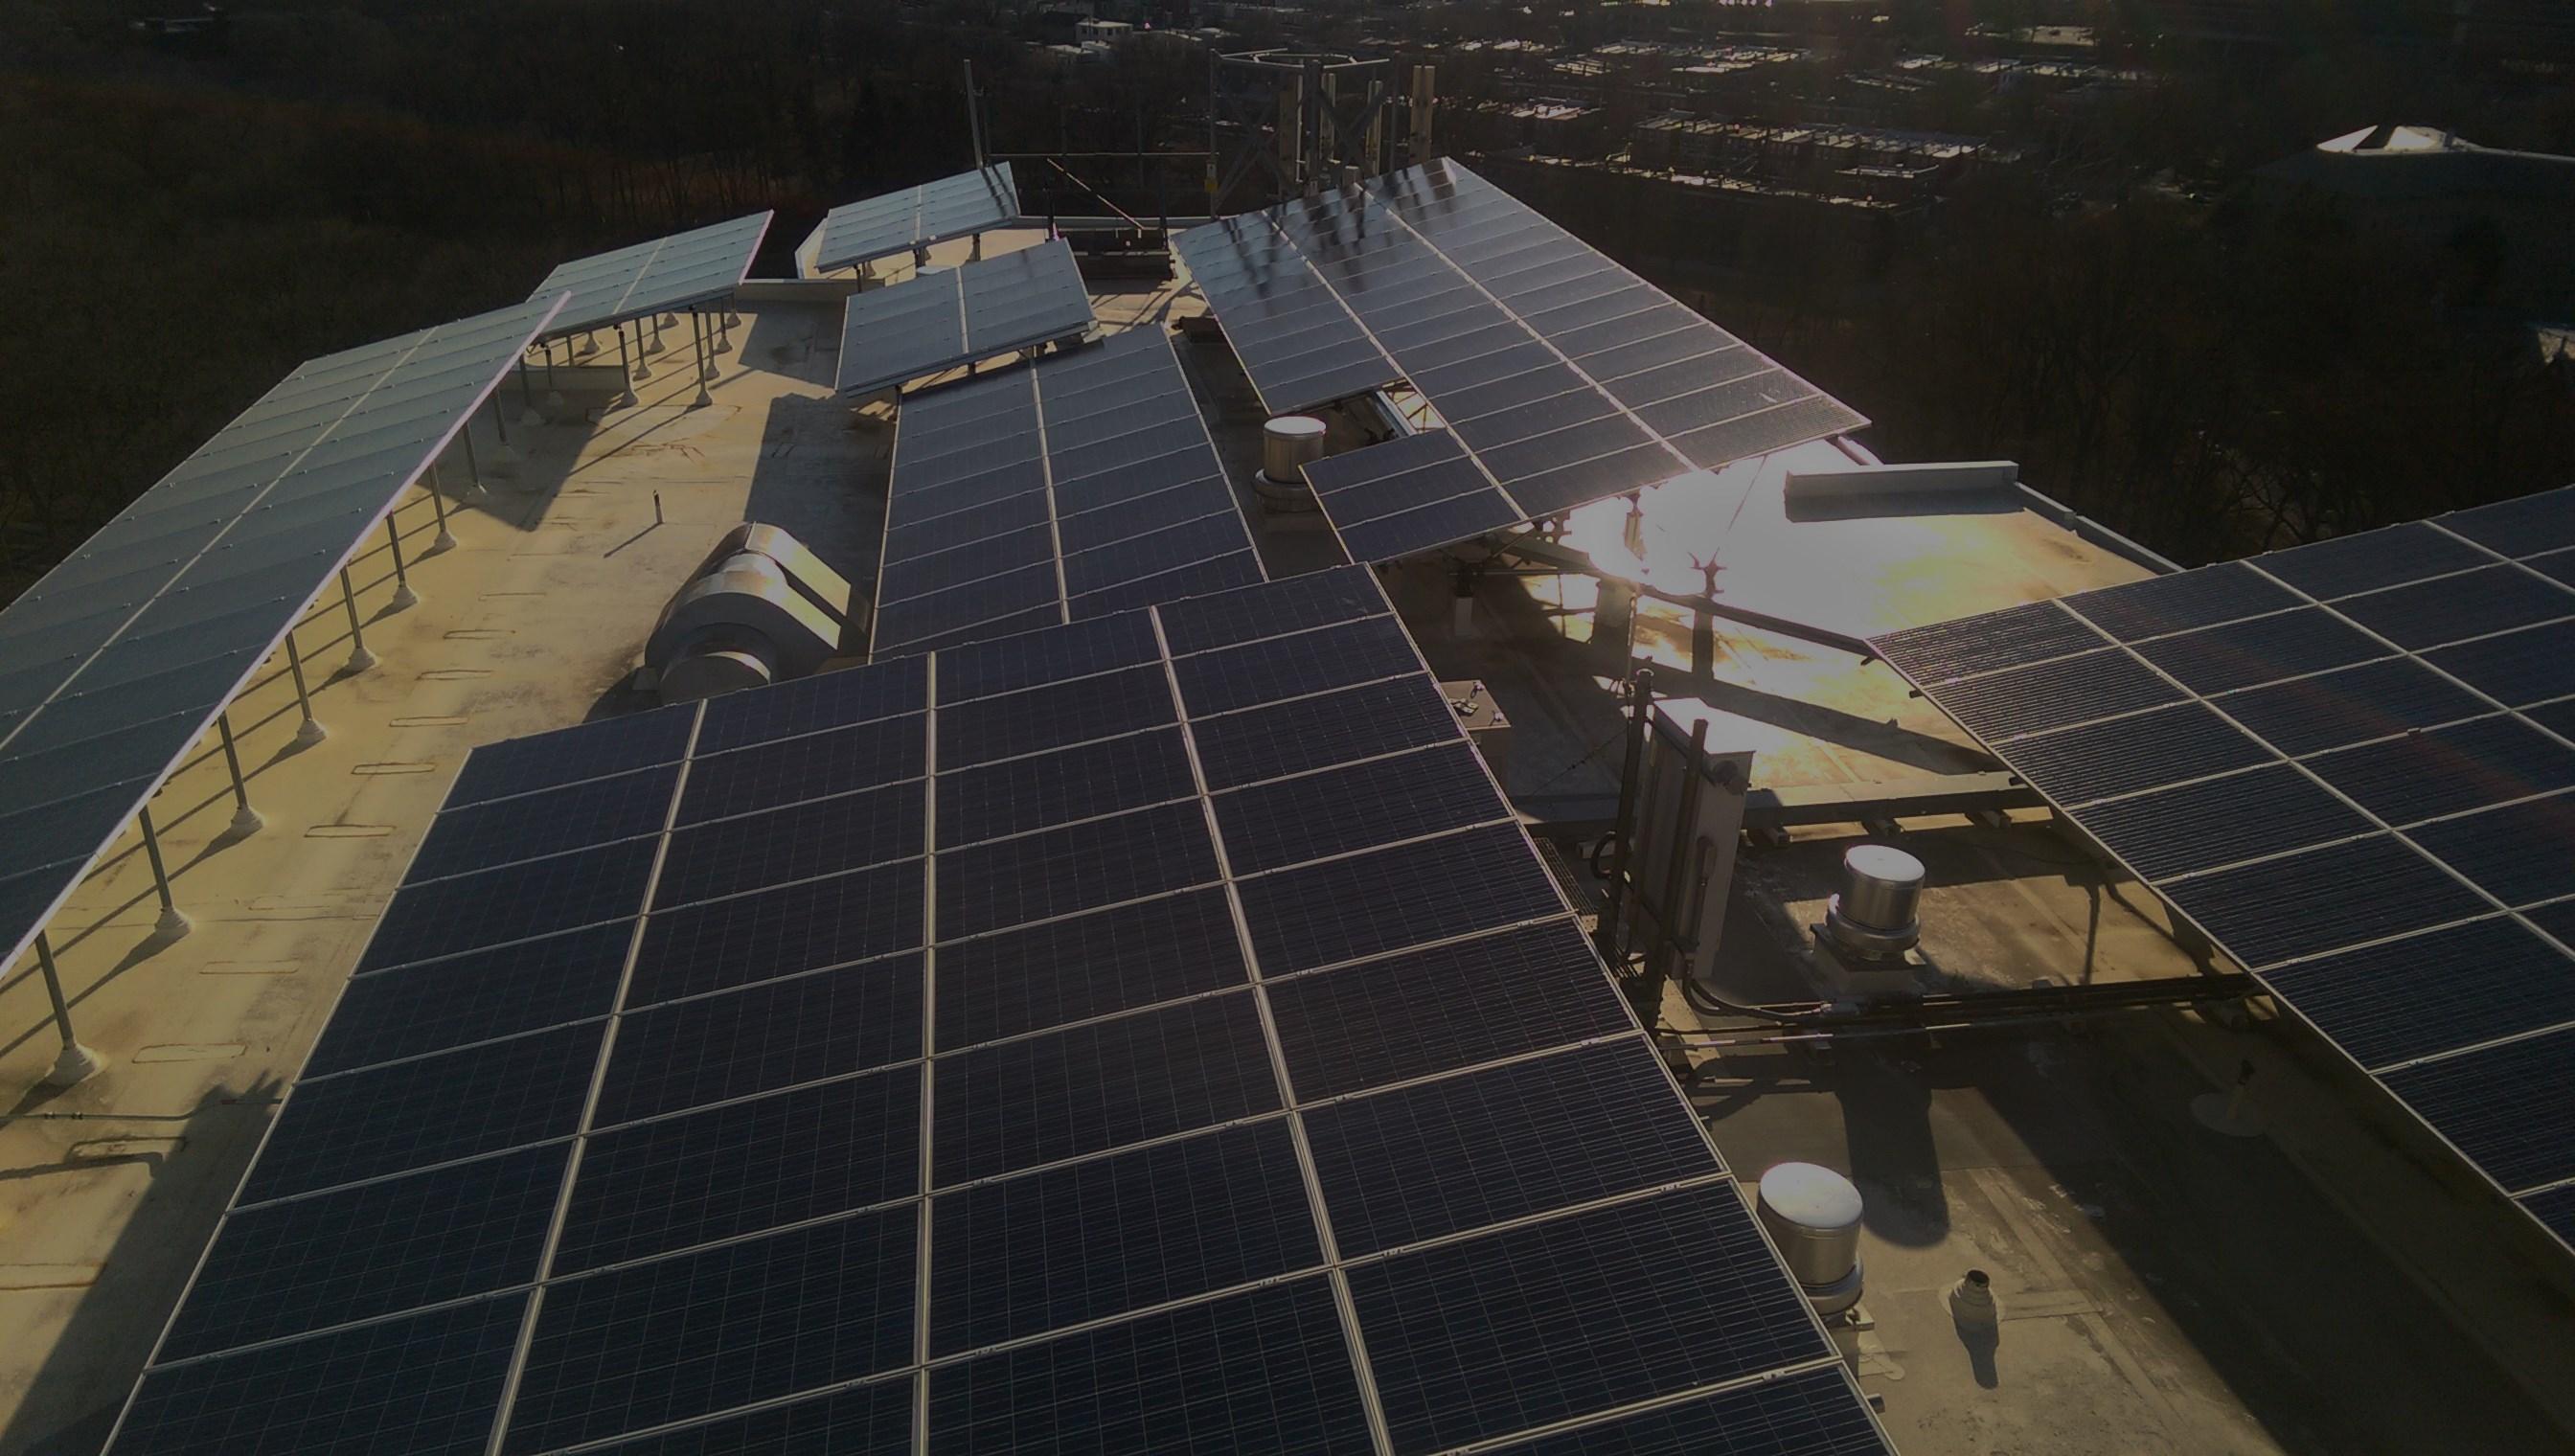 Solar Panel Array atop City High Rise Building....$550,000